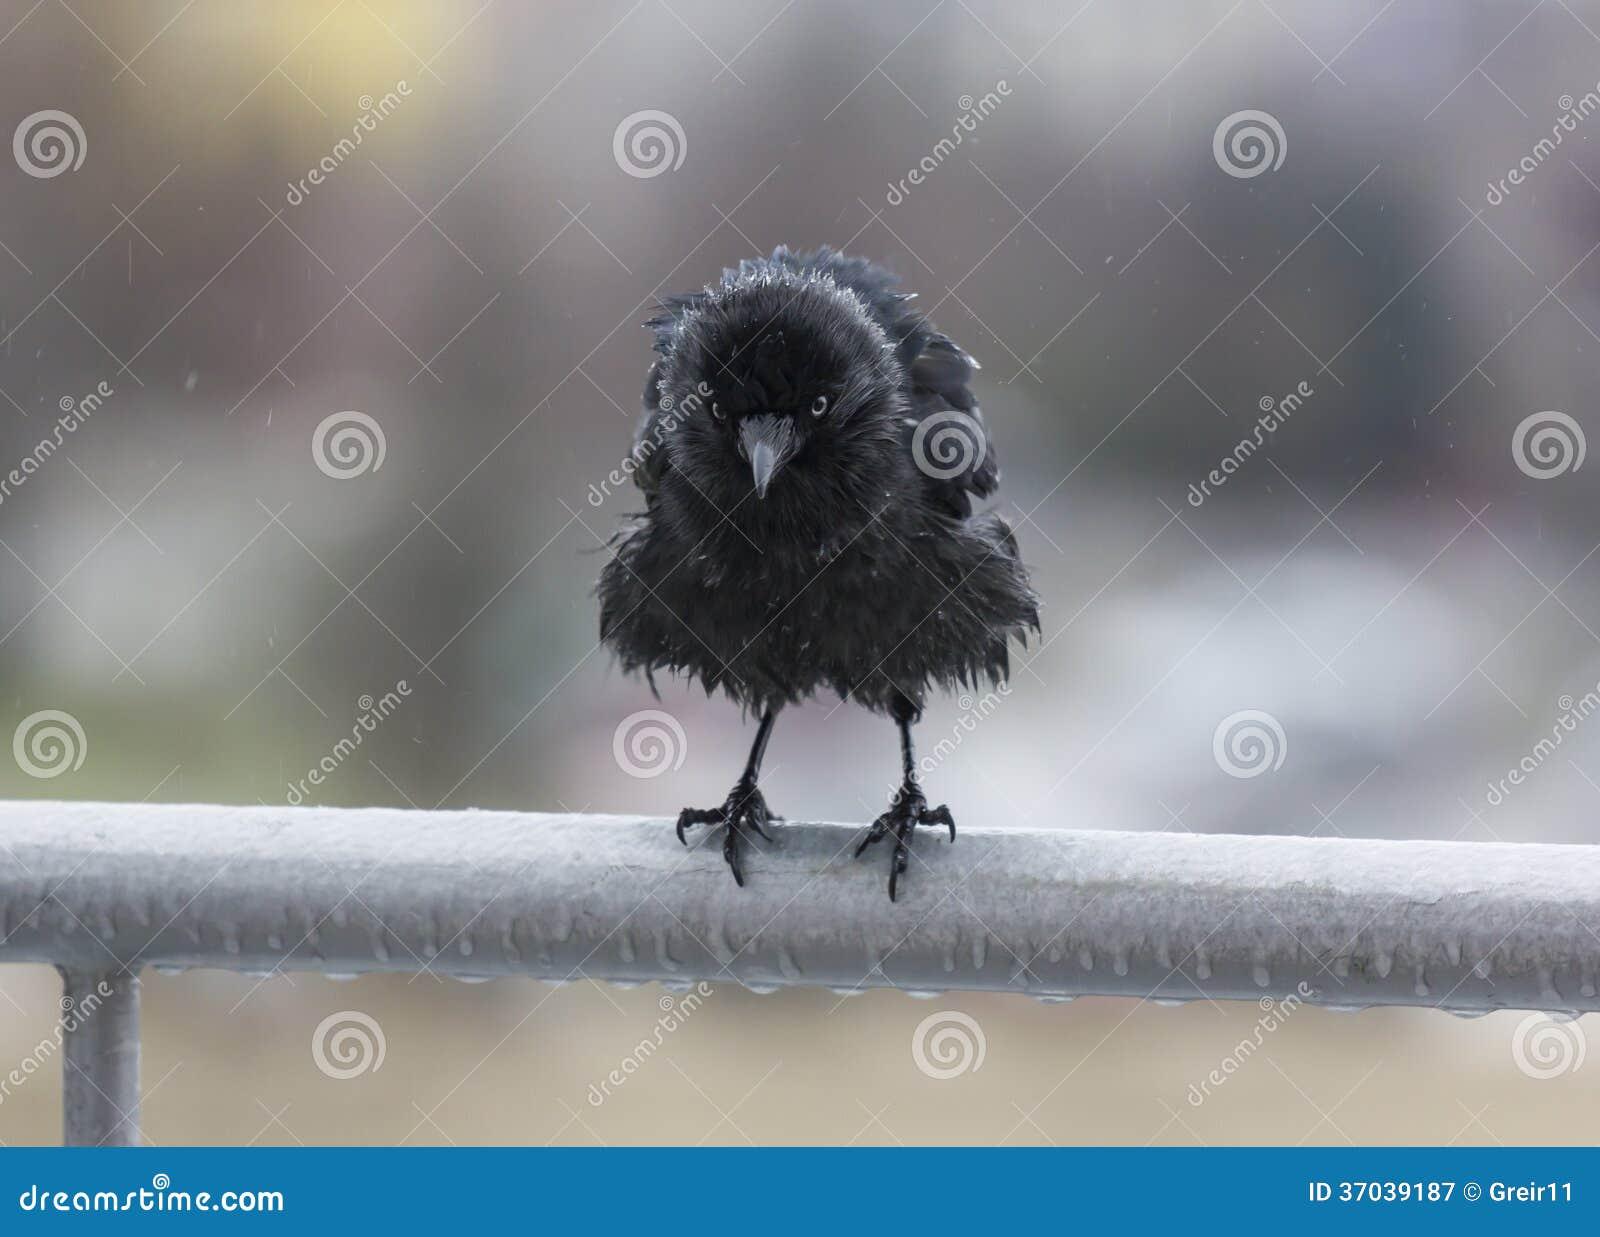 Miserable wet crow clutching balcony rail in the rain